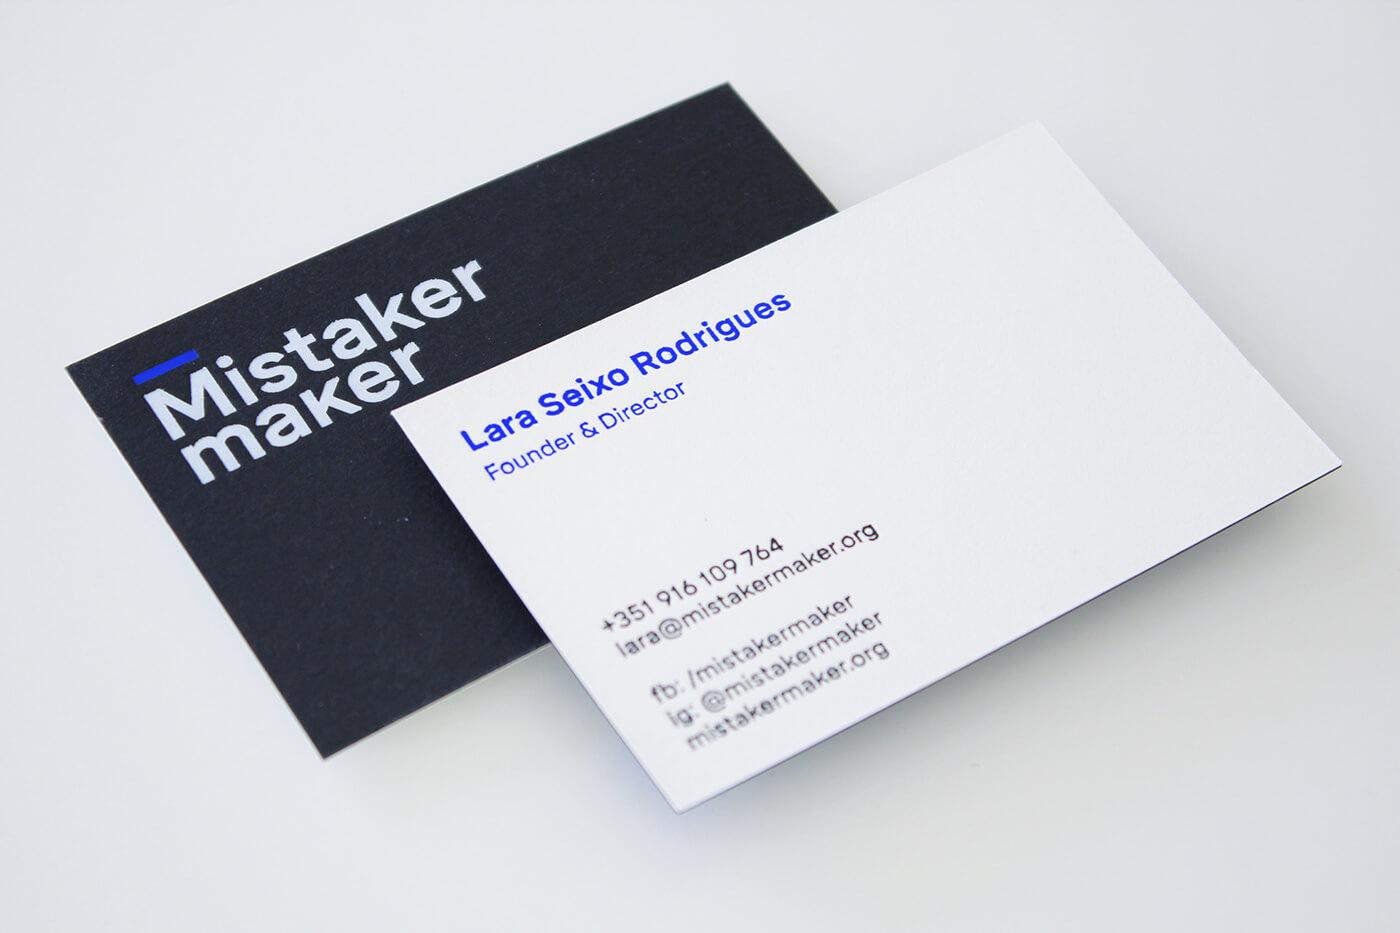 WF-MistakerMaker07